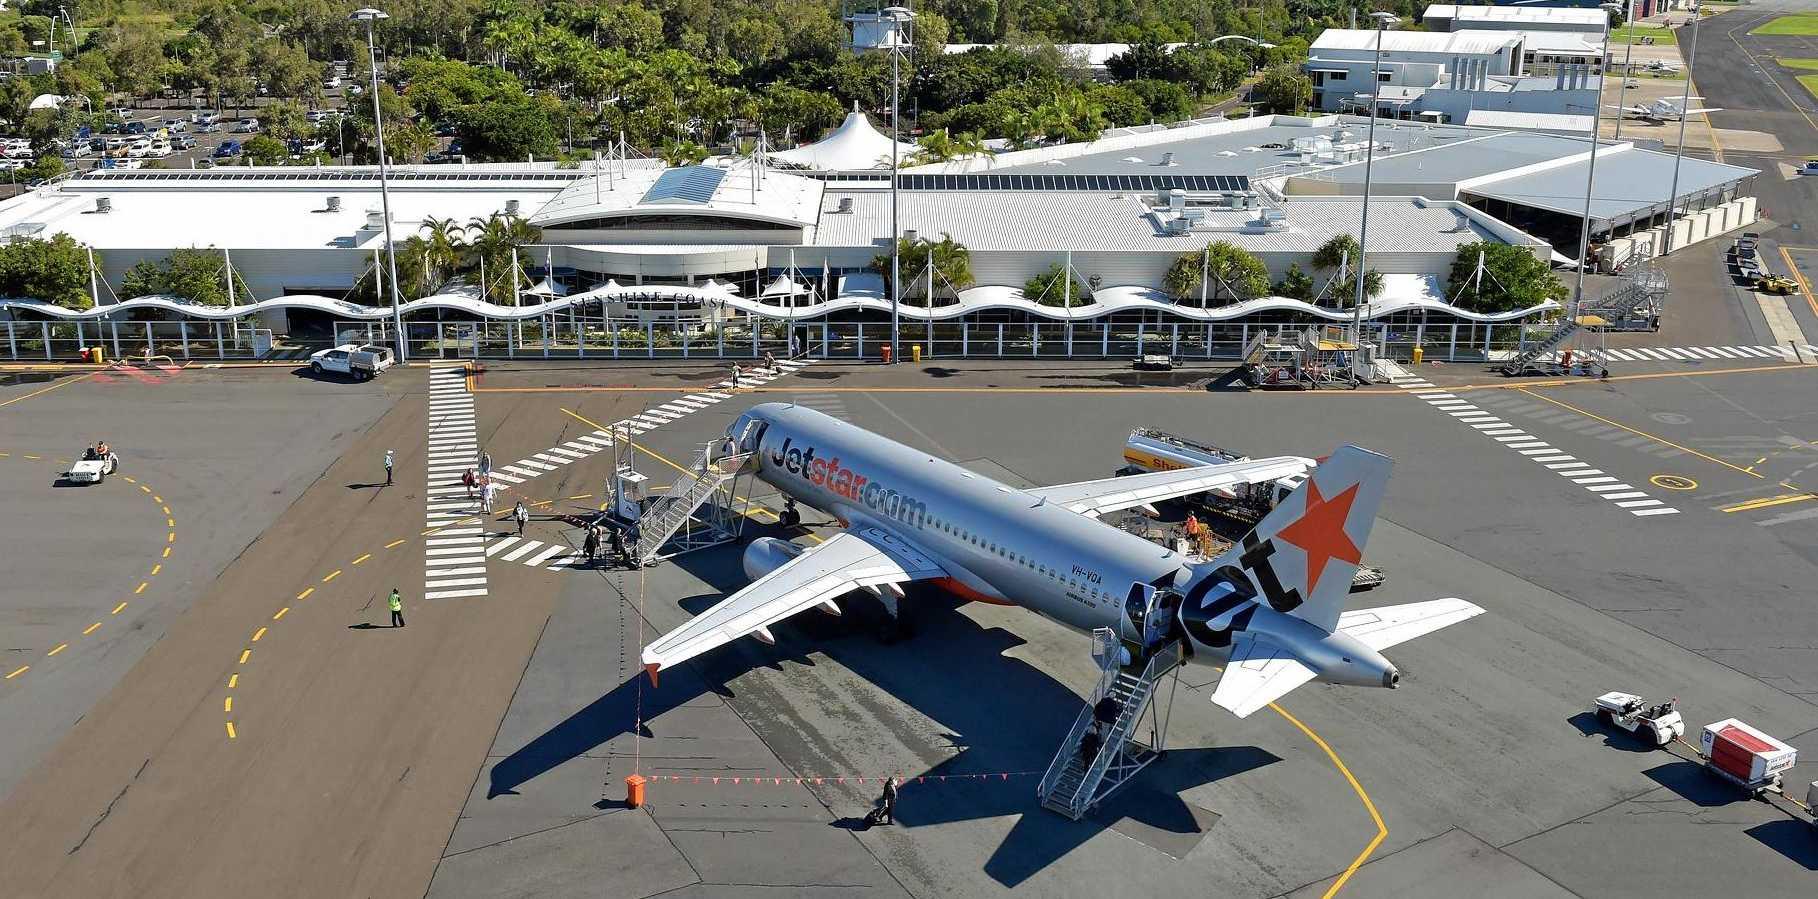 Jetstar is offering free return flights.